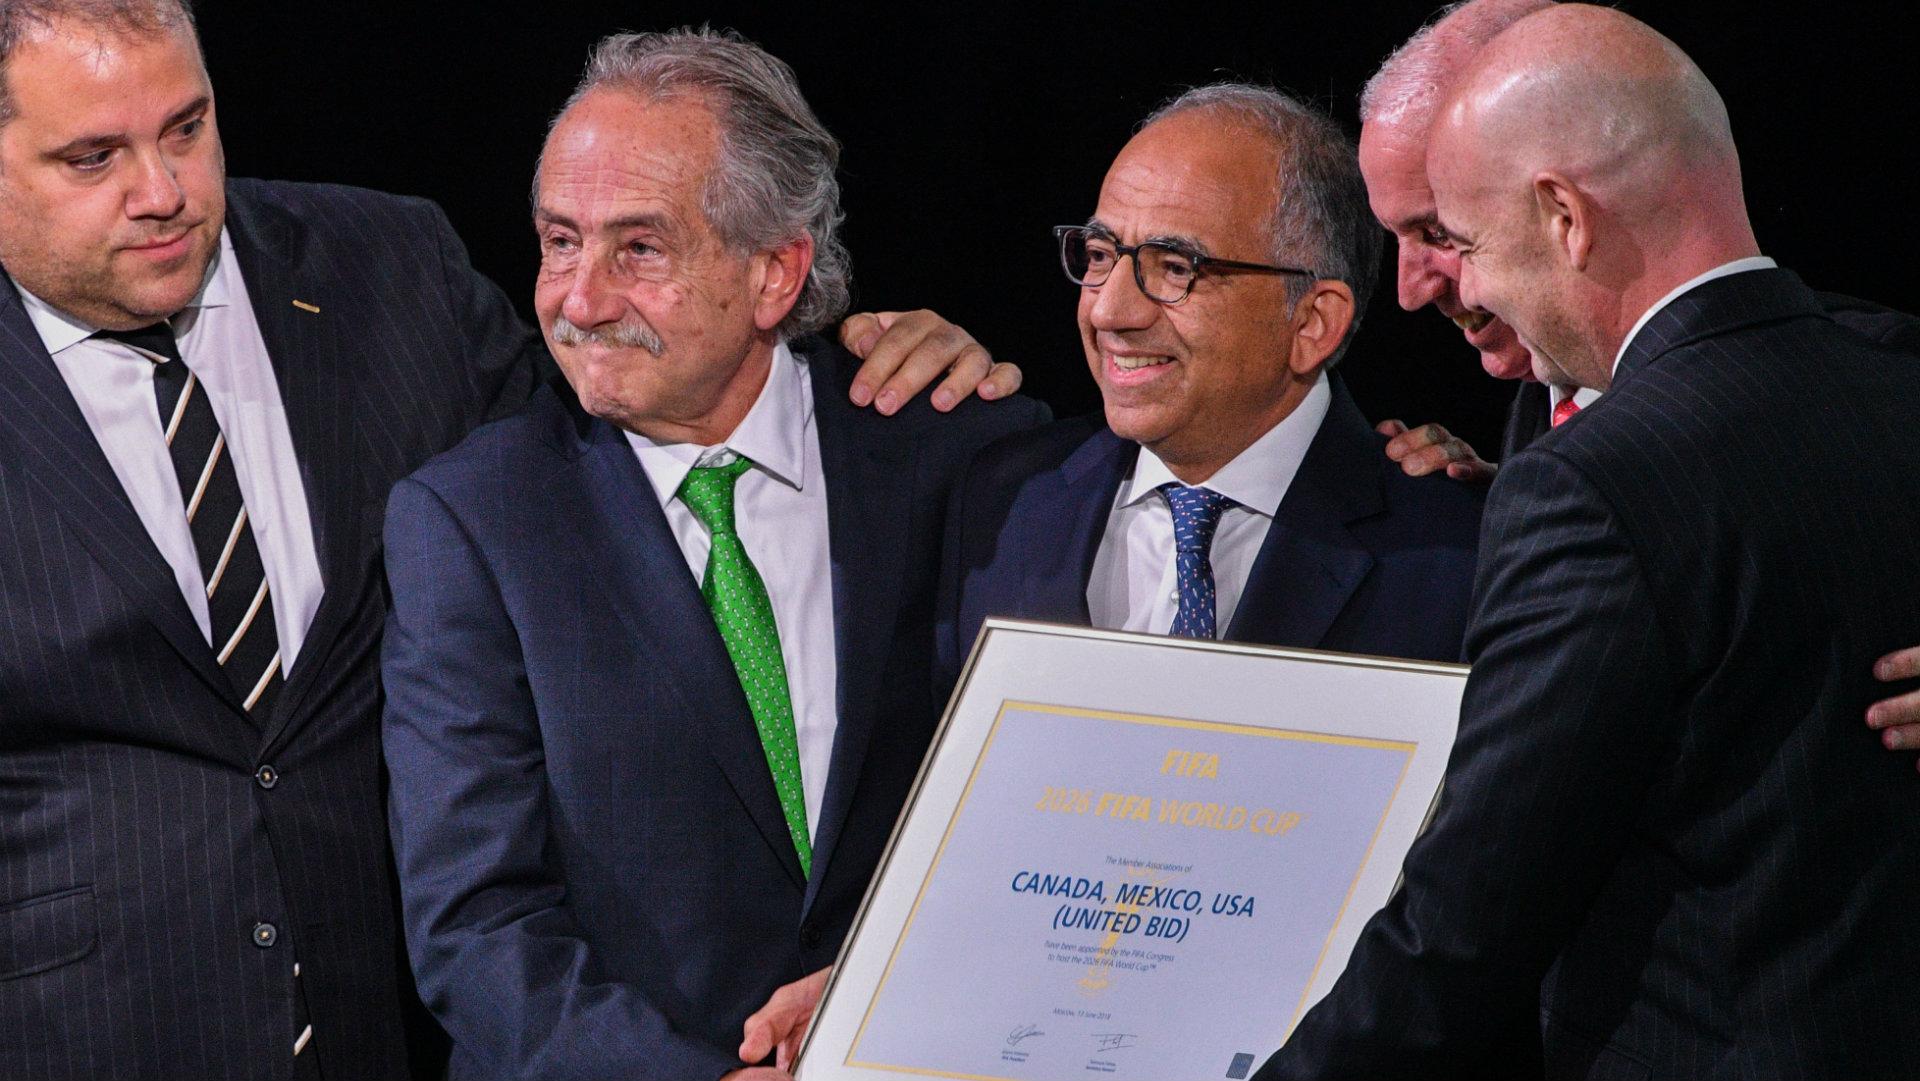 Carlos Cordeiro Decio de Maria Serrano Steve Reed United Bid World Cup 2026